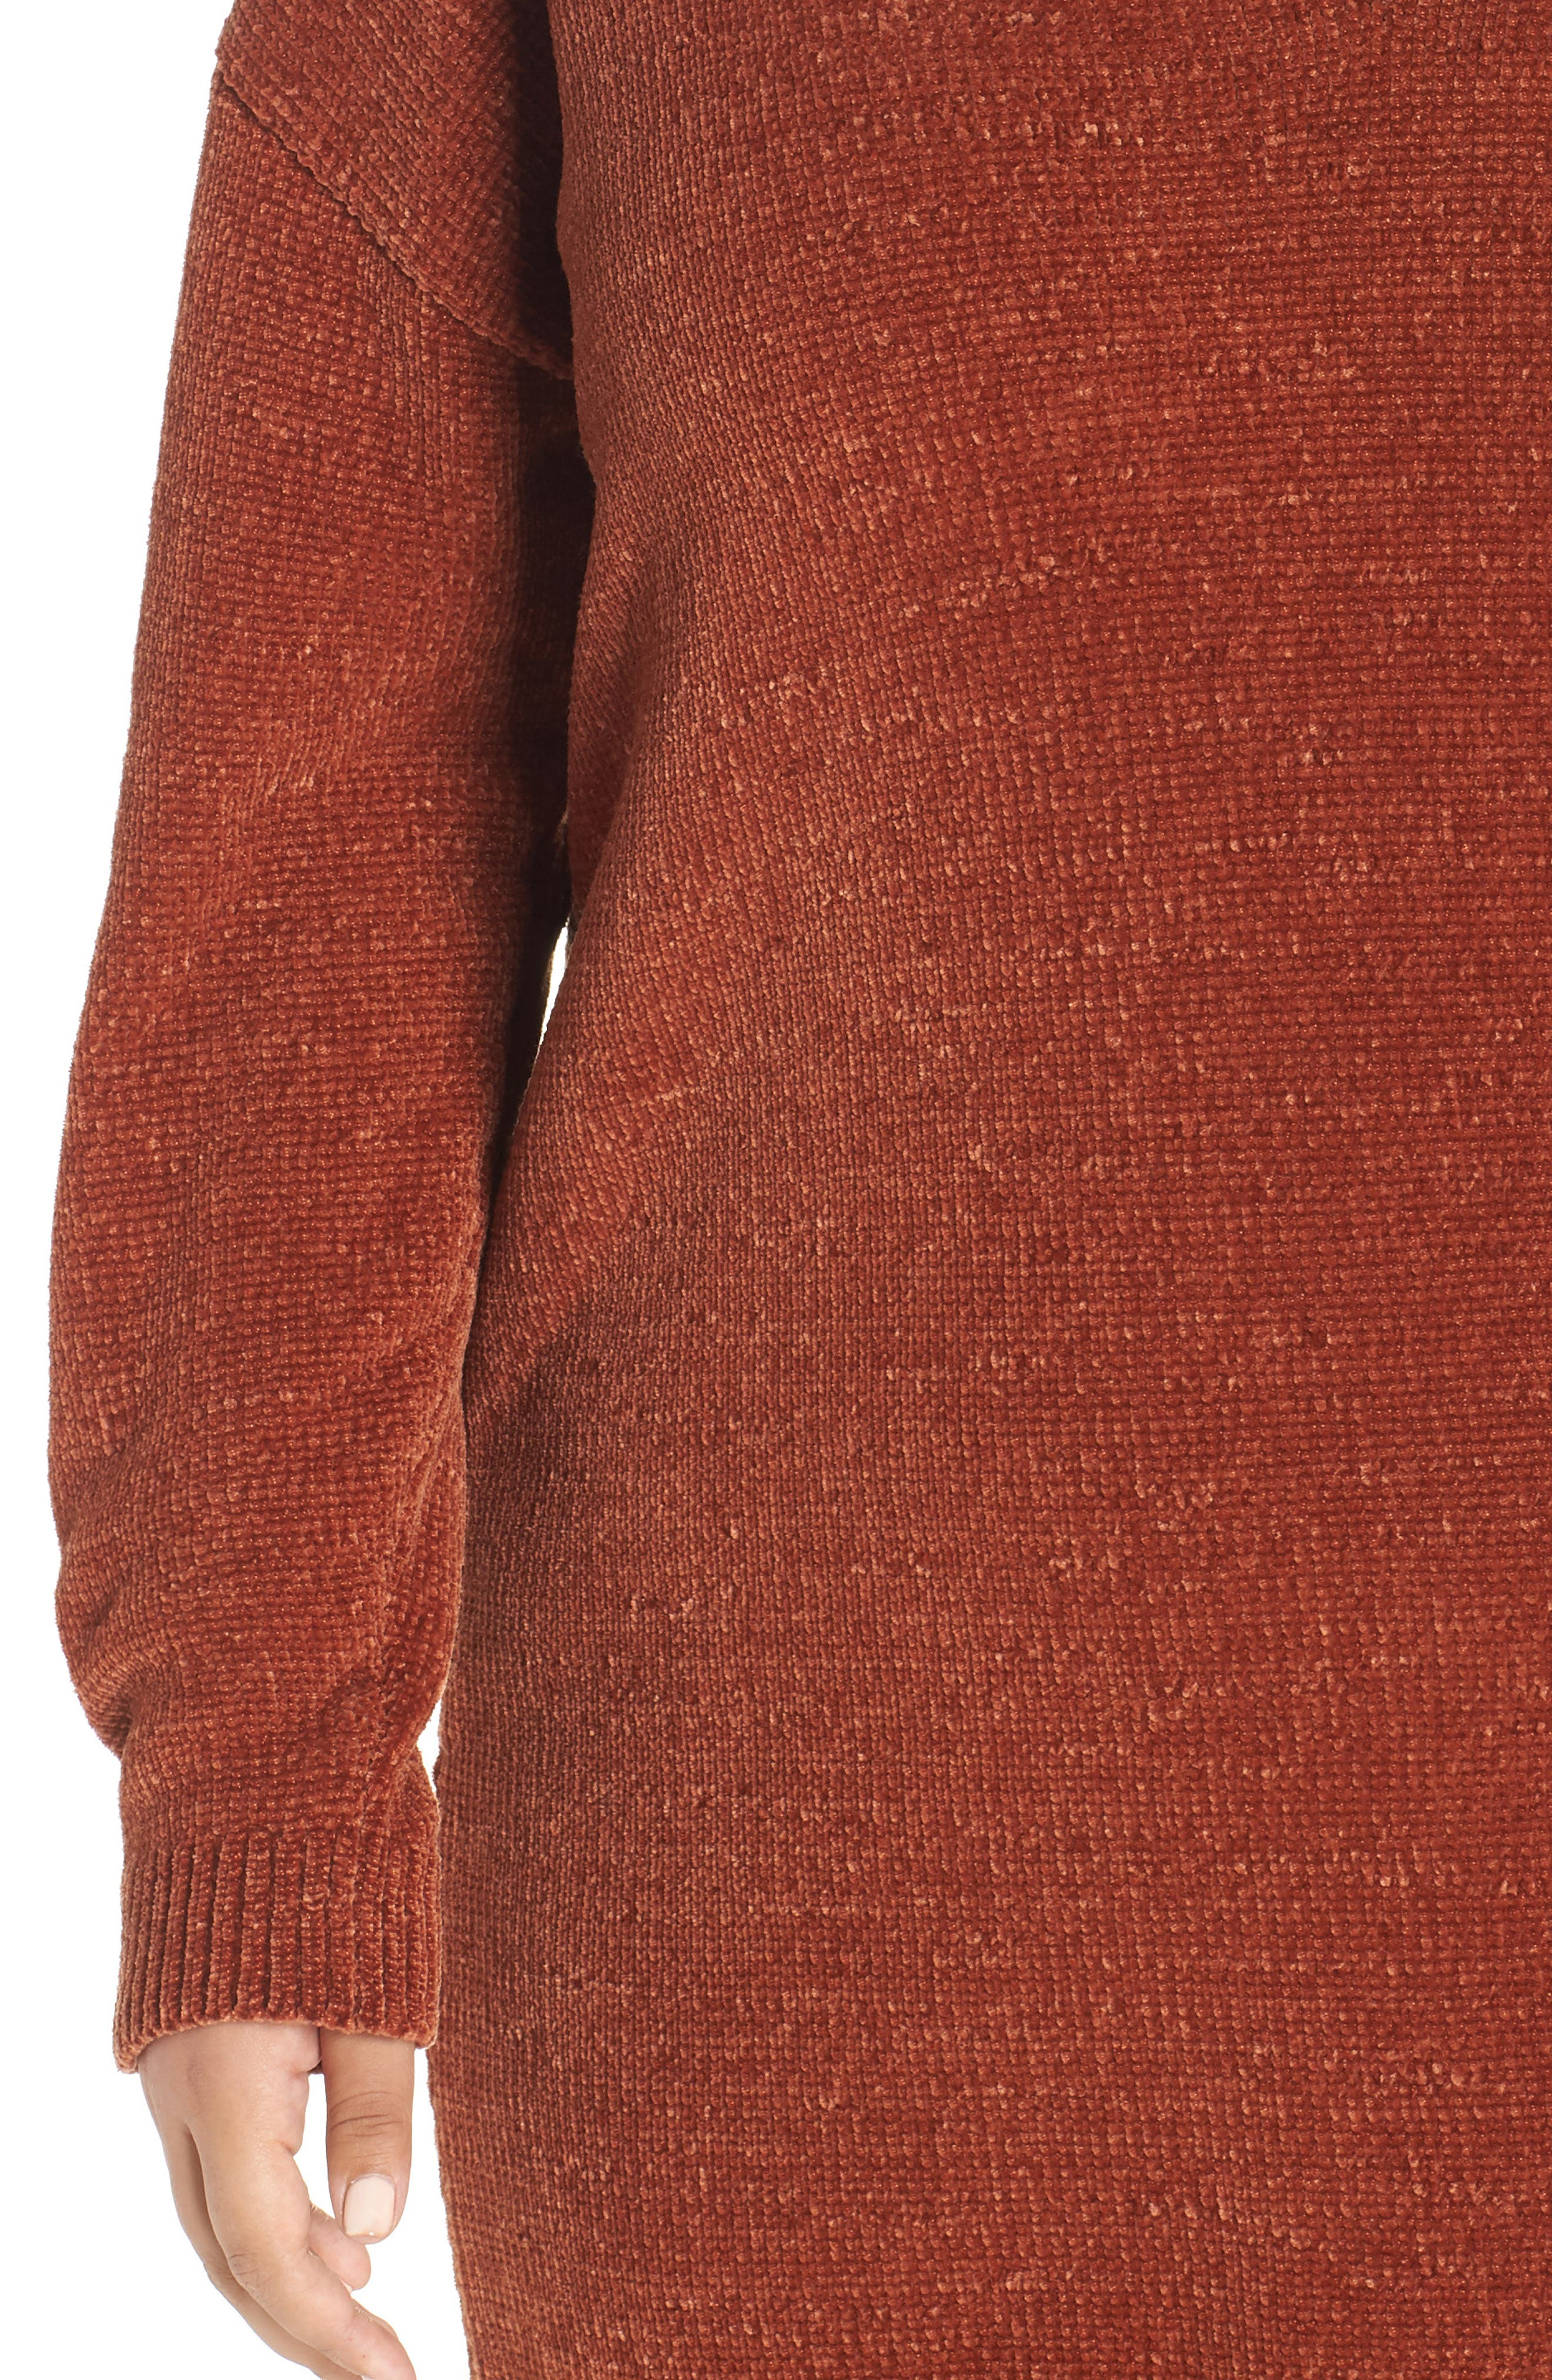 Chenille Sweater Dress,                             Alternate thumbnail 4, color,                             221